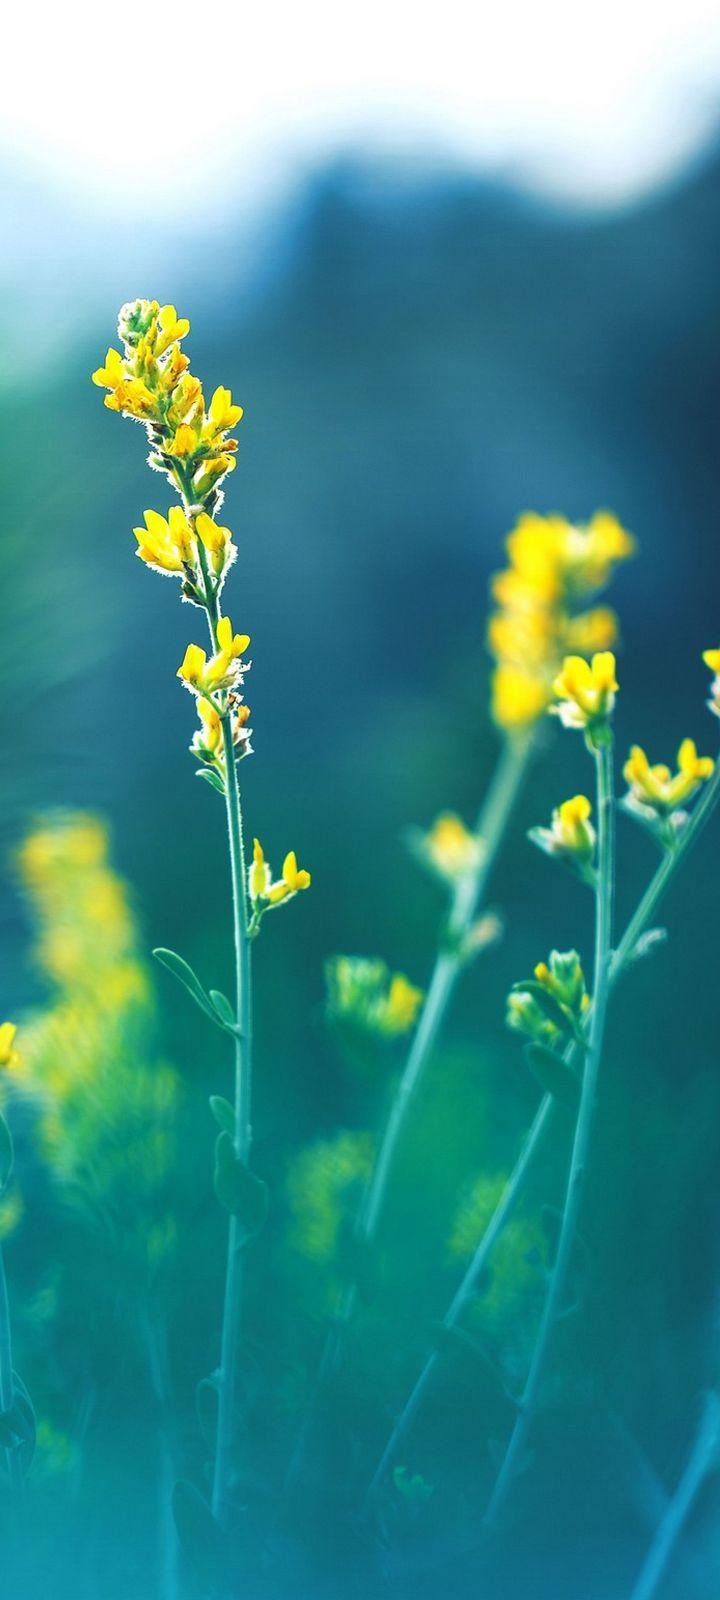 Yellow Flowers Blur Wallpaper 720x1600